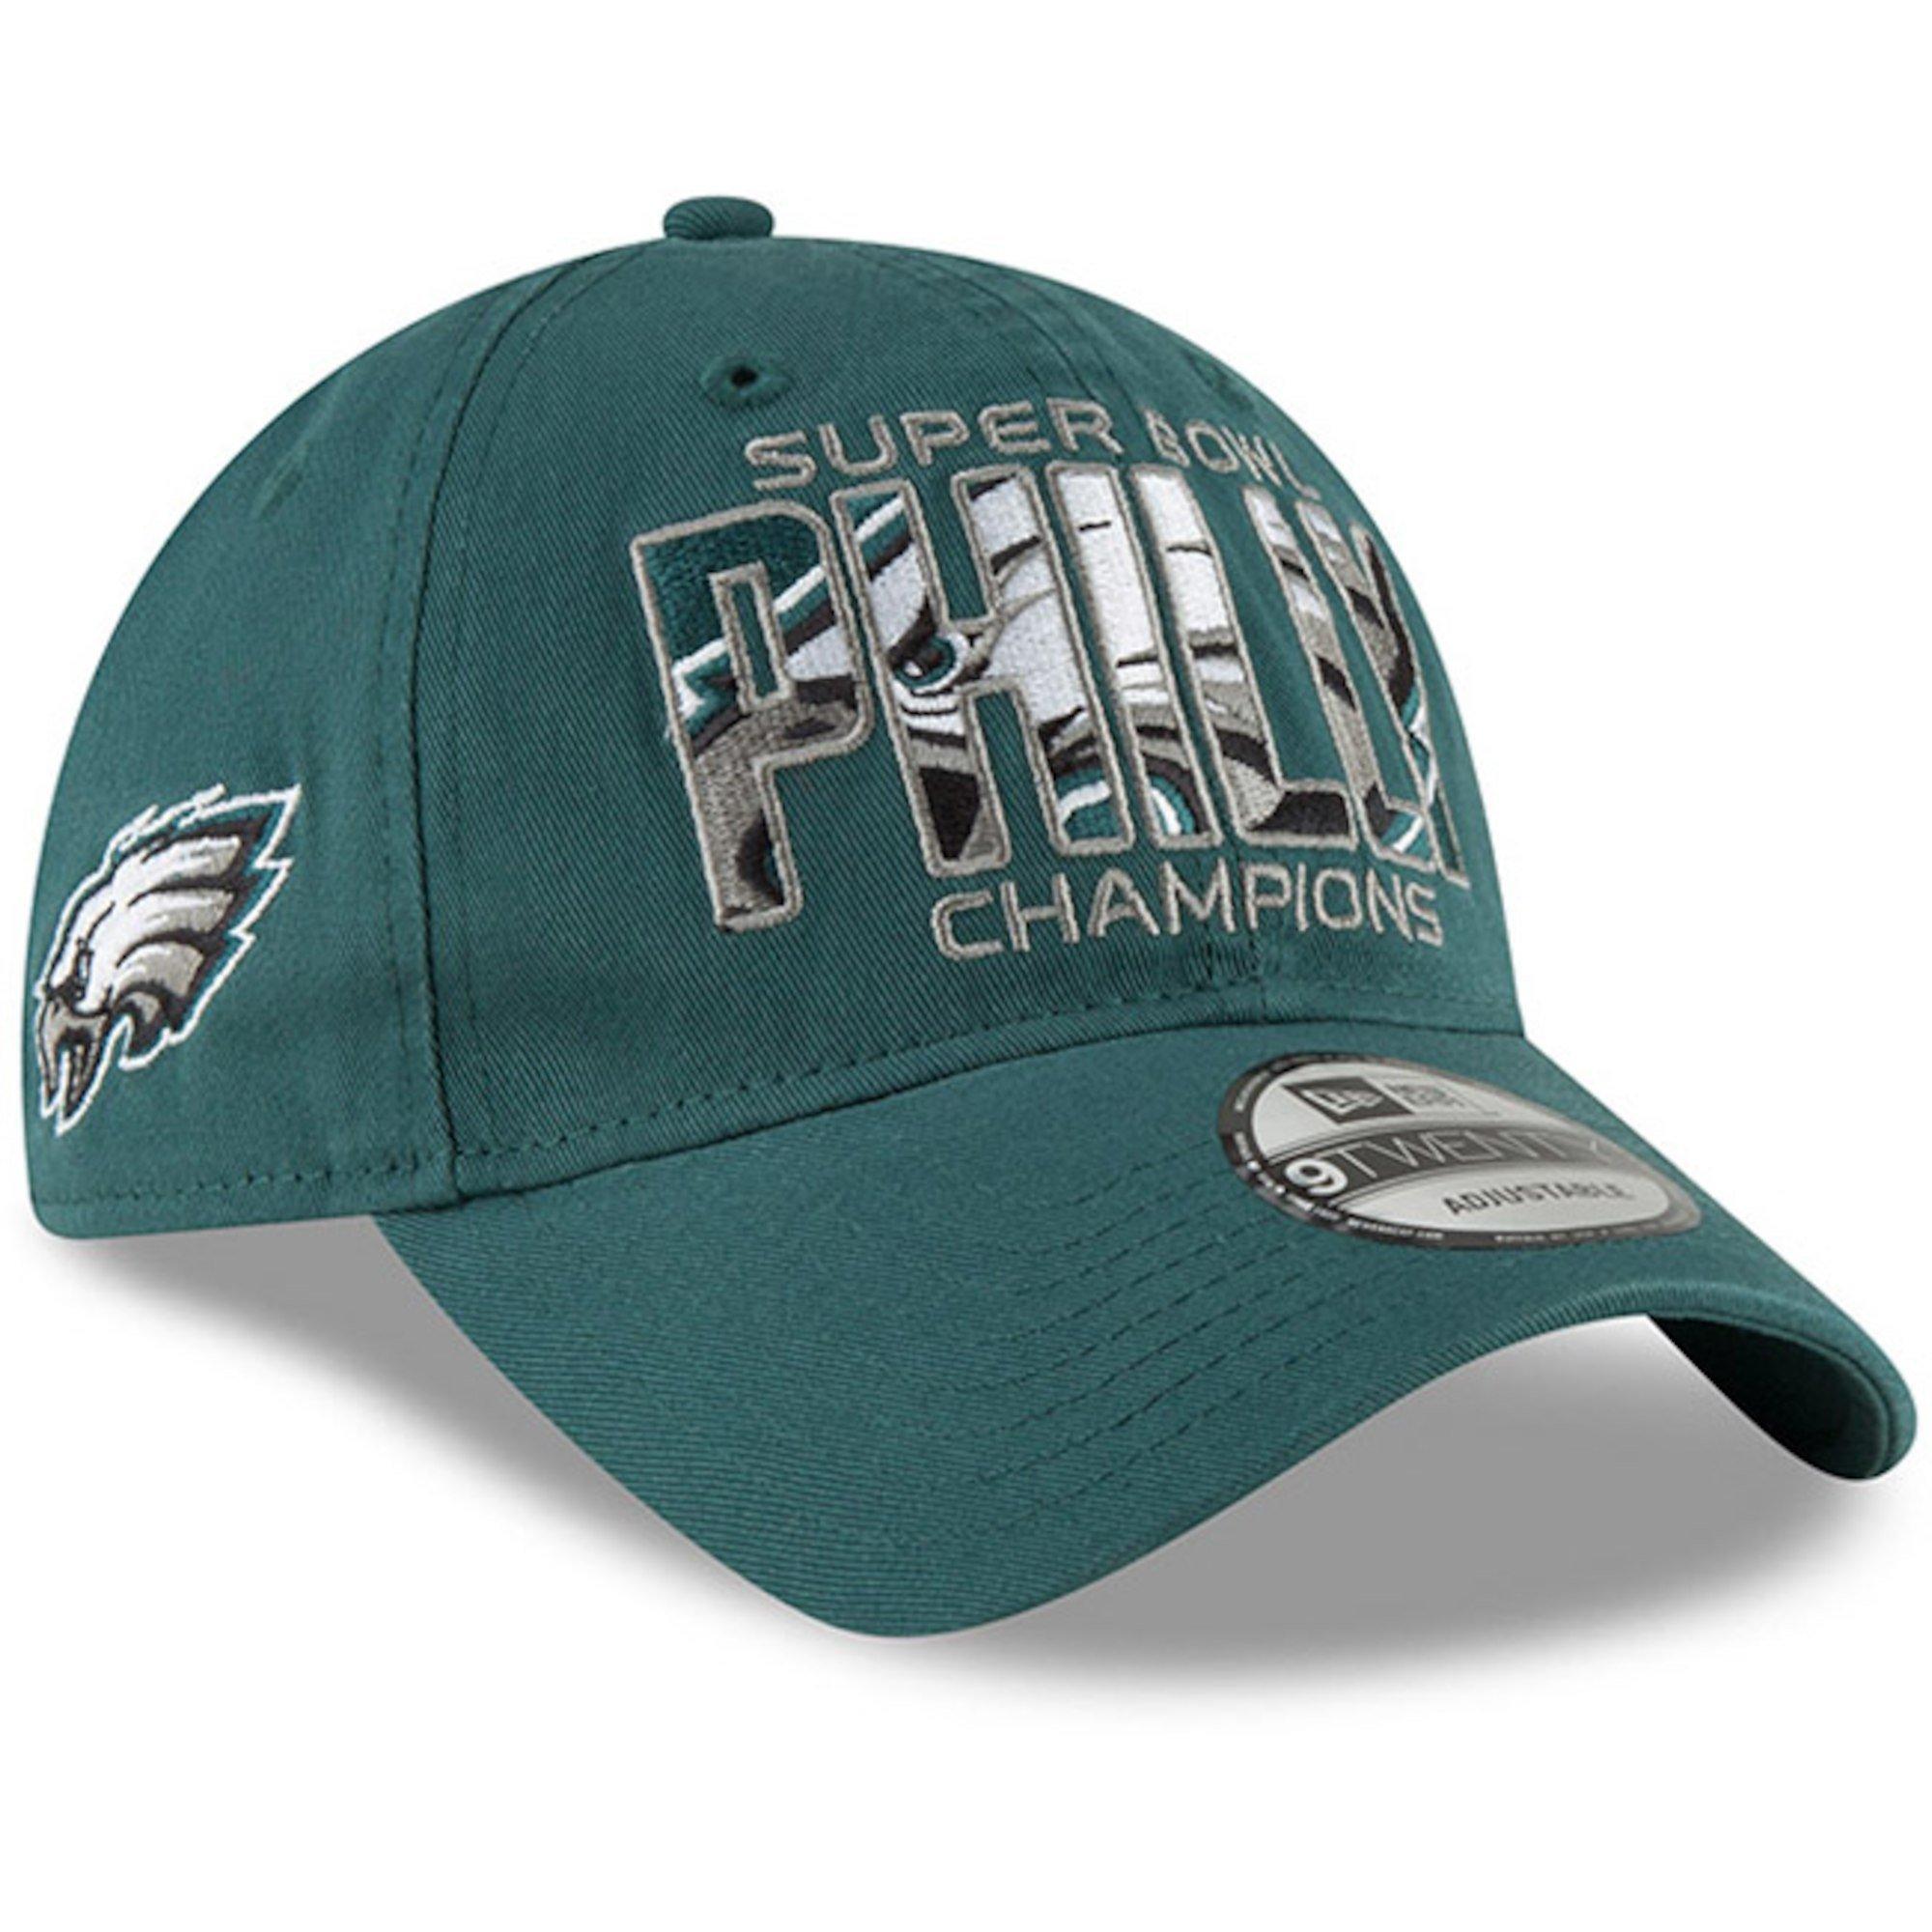 48870d842d6 New Era Authentic Philadelphia Eagles Super Bowl LII Champions in-Between  Midnight Green 9TWENTY Adjustable